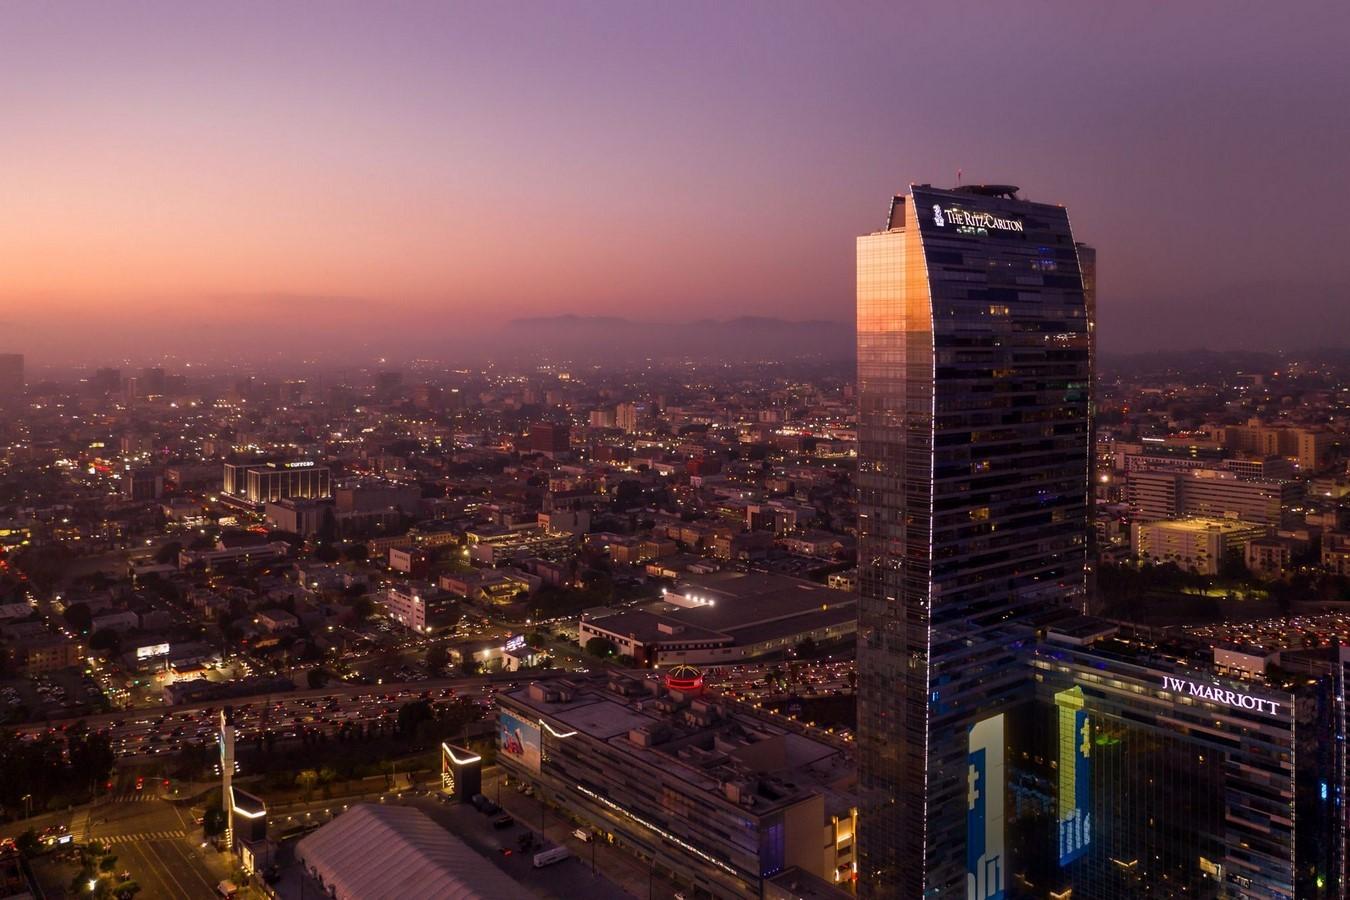 L.A. Live Hotel & Condominiums (The Ritz-Carlton Los Angeles) - Sheet2